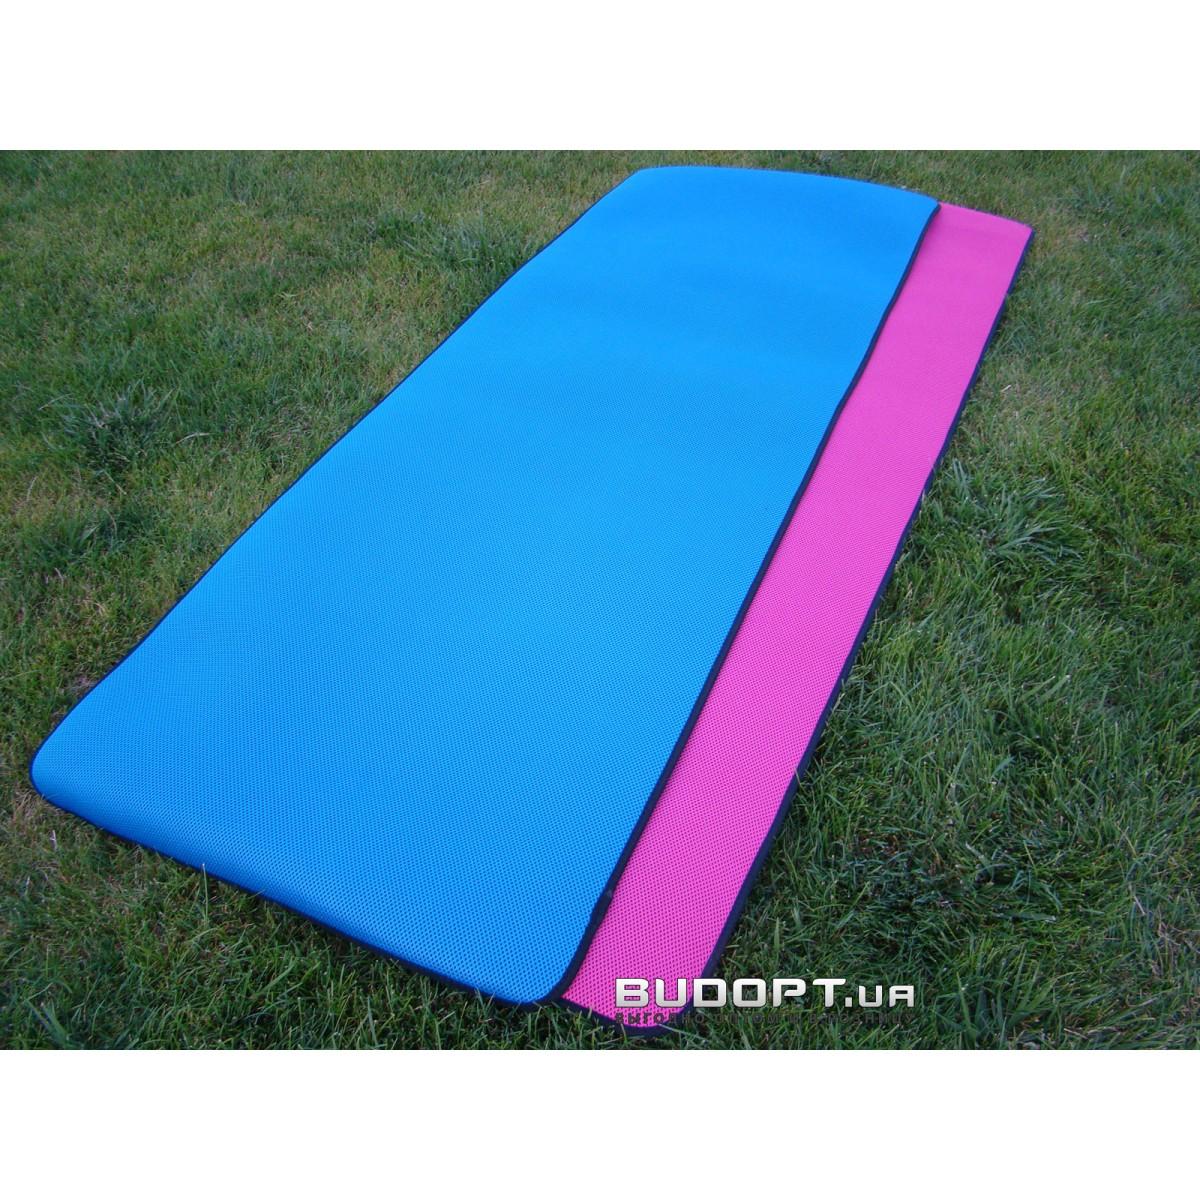 e03c6b5a7179 Коврик для йоги и фитнеса TPE+NY 5мм (FI-4531-BL) Yoga mat. Купить ...